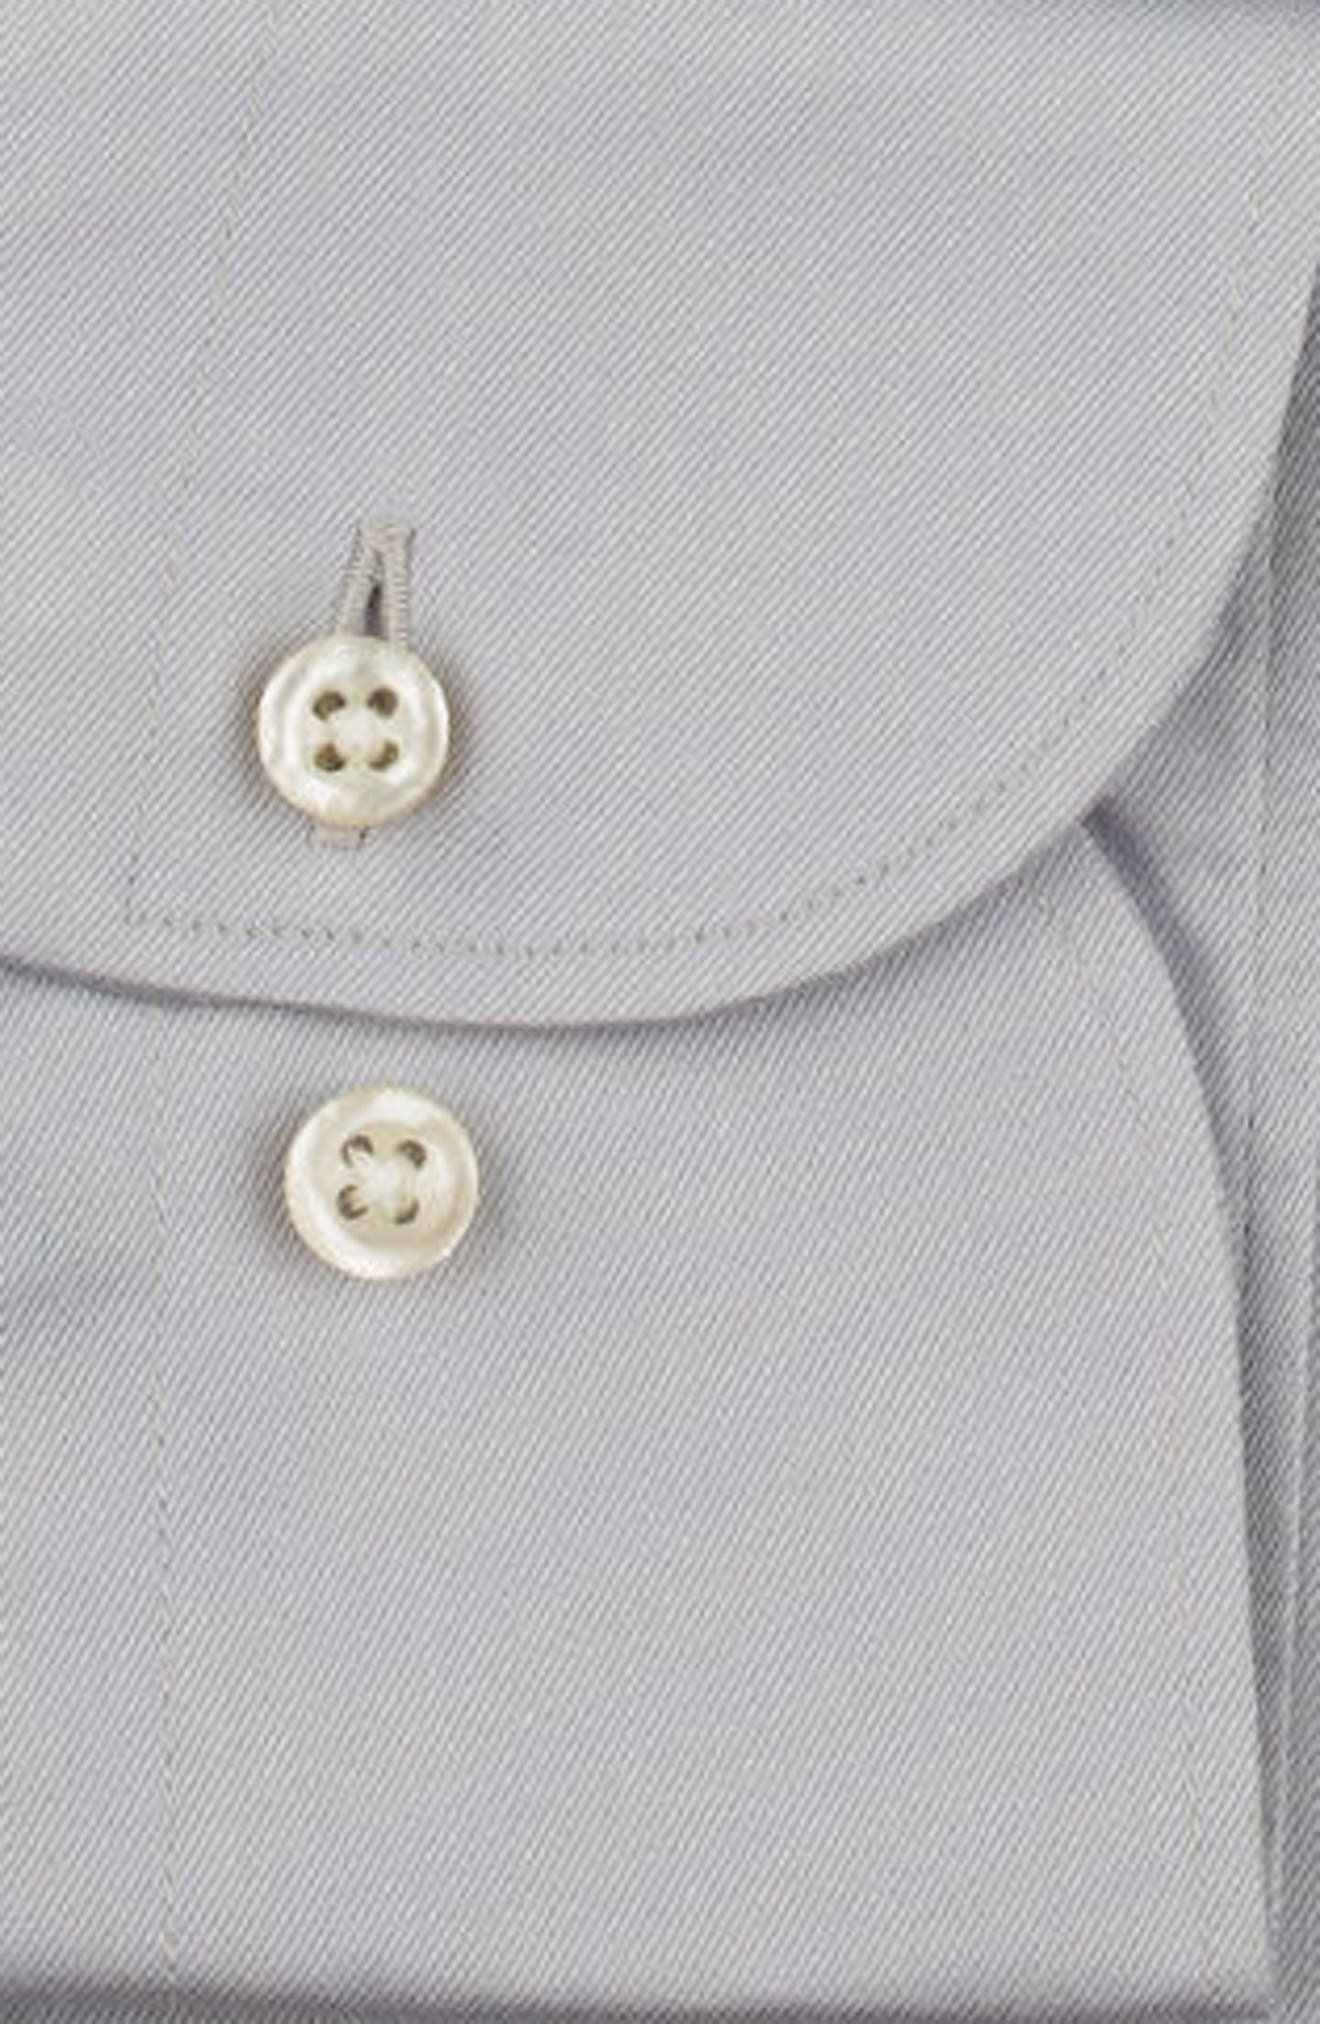 Regular Fit Solid Dress Shirt,                             Alternate thumbnail 6, color,                             020